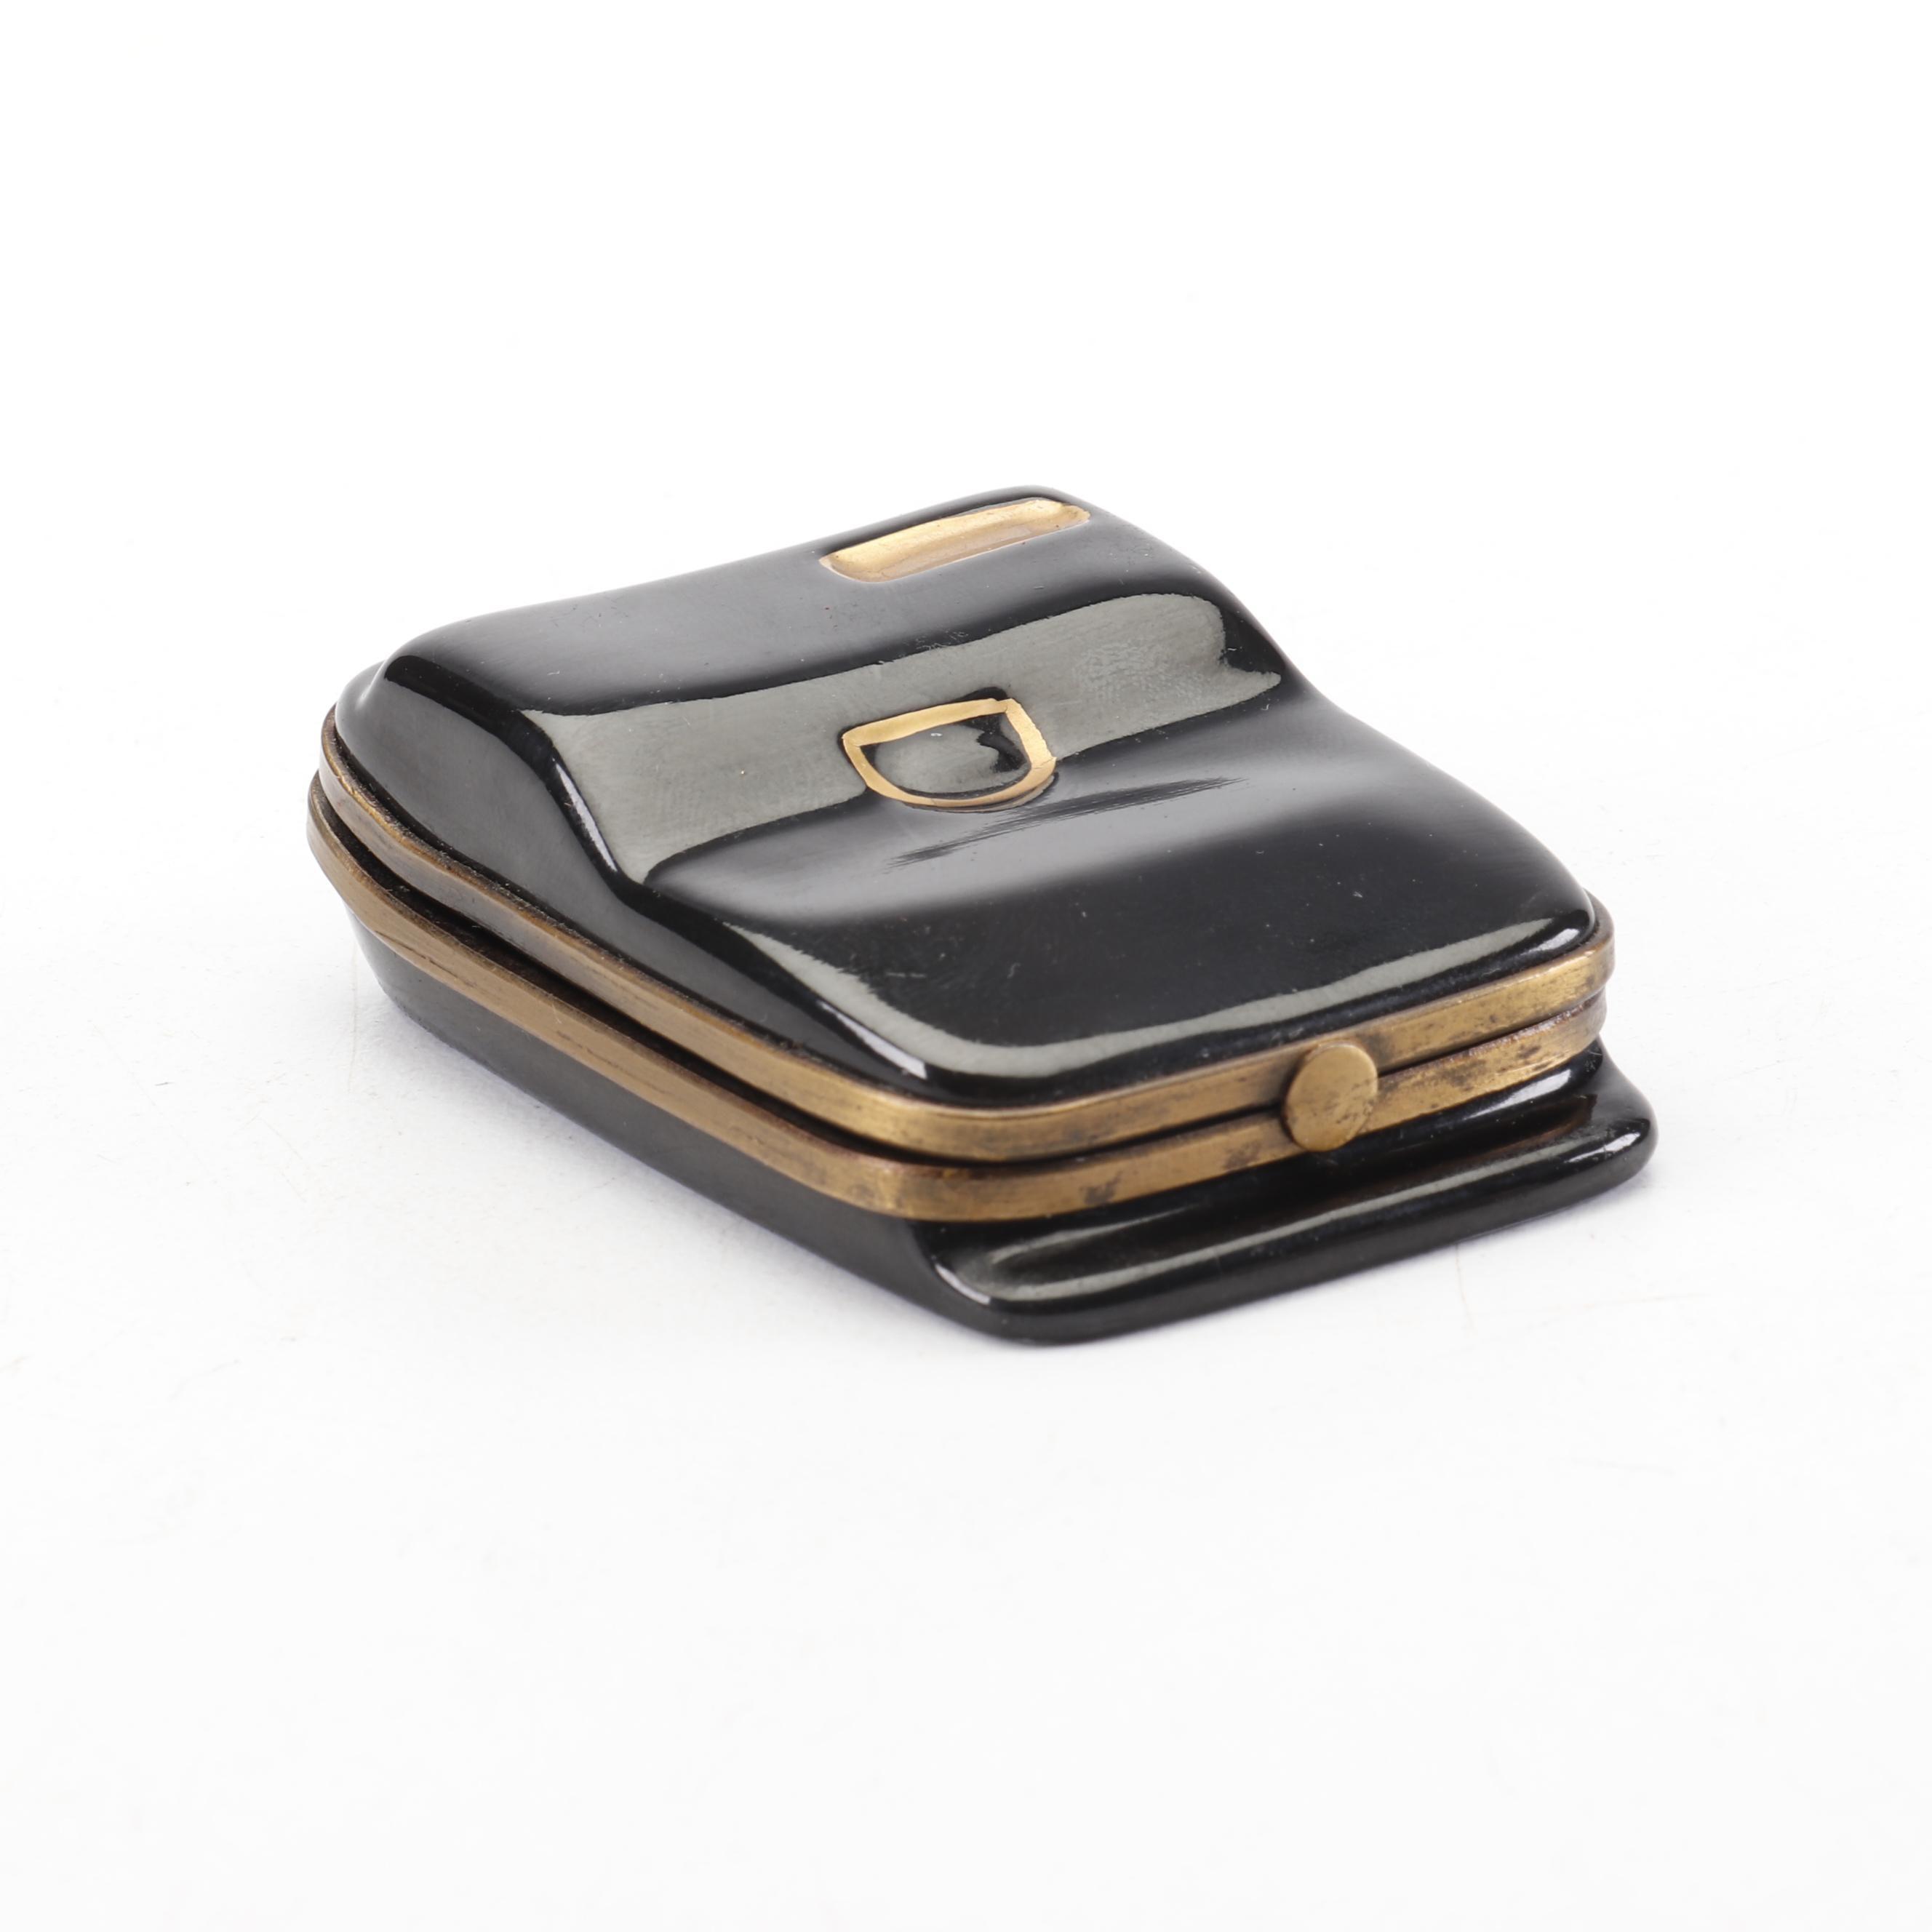 Eximious Hand Painted Limoges Porcelain Flip Phone Trinket Box